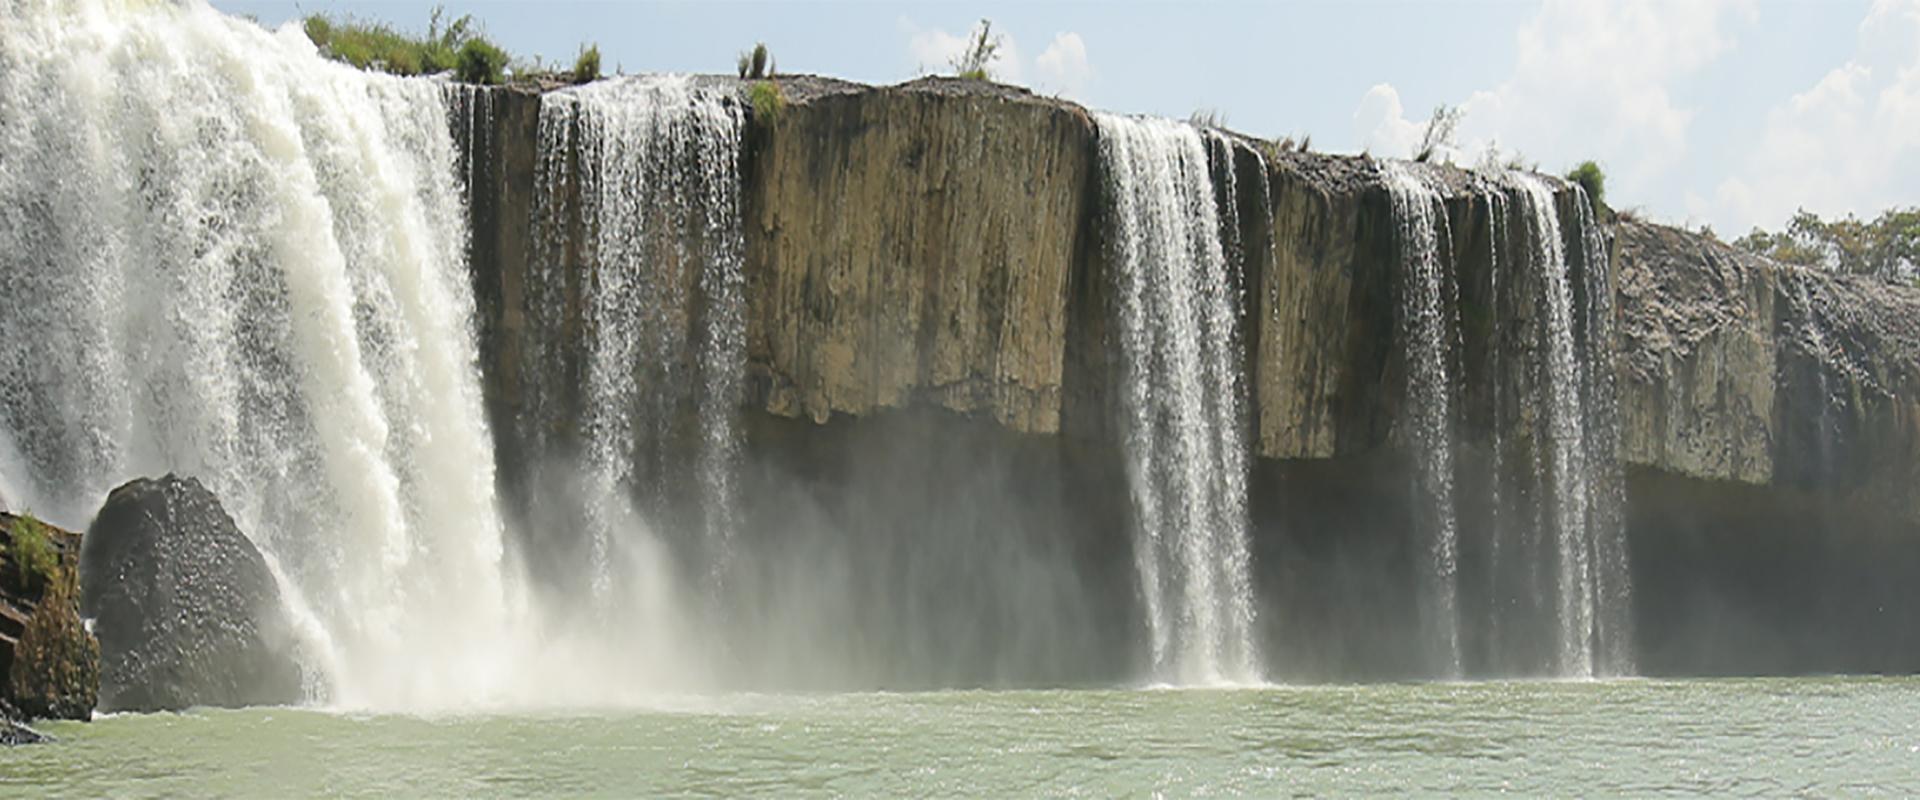 cascade haut plateau